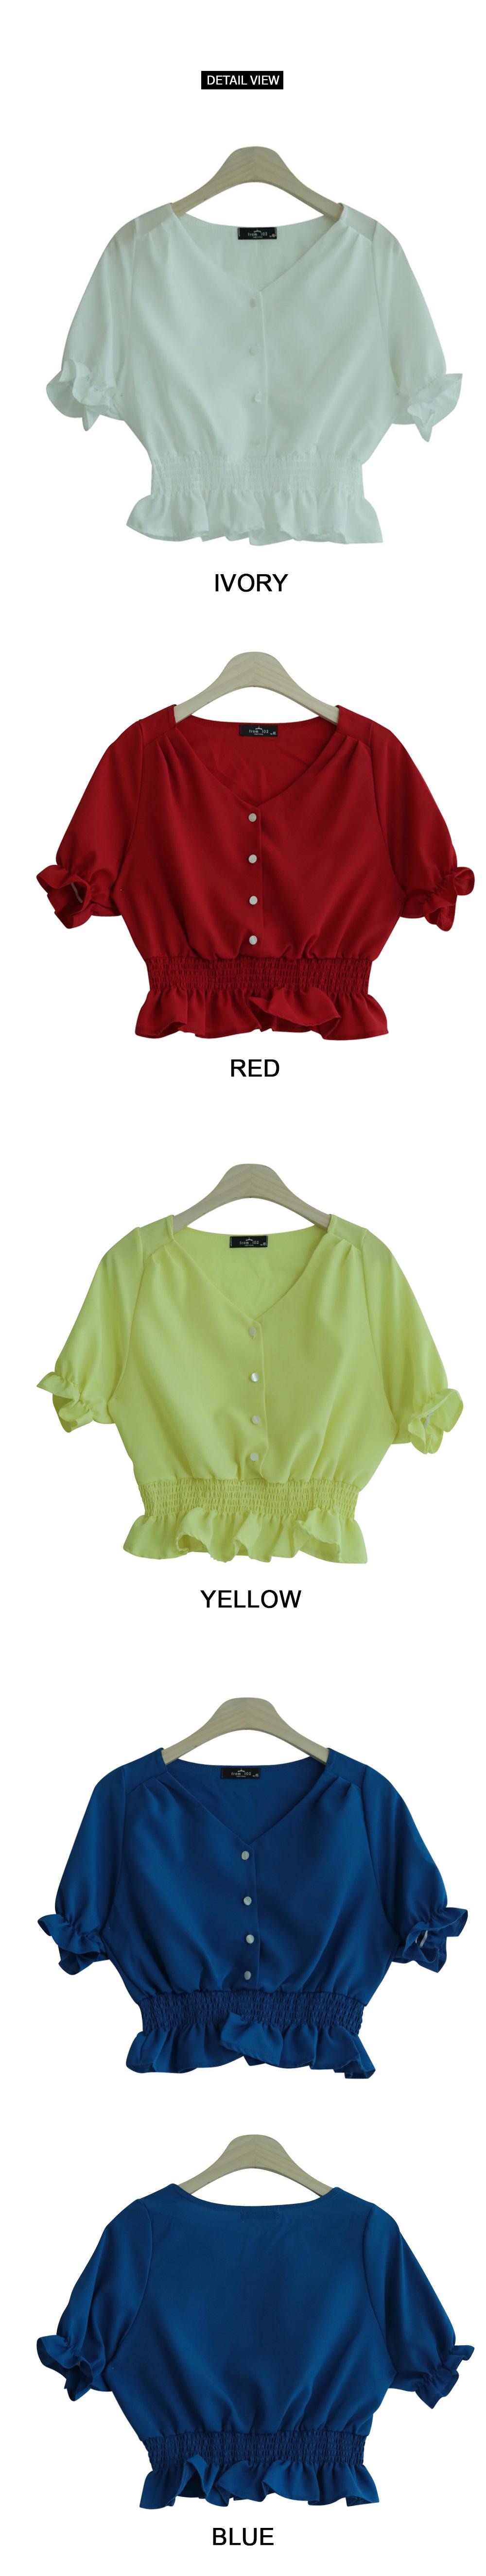 Tocking short blouse